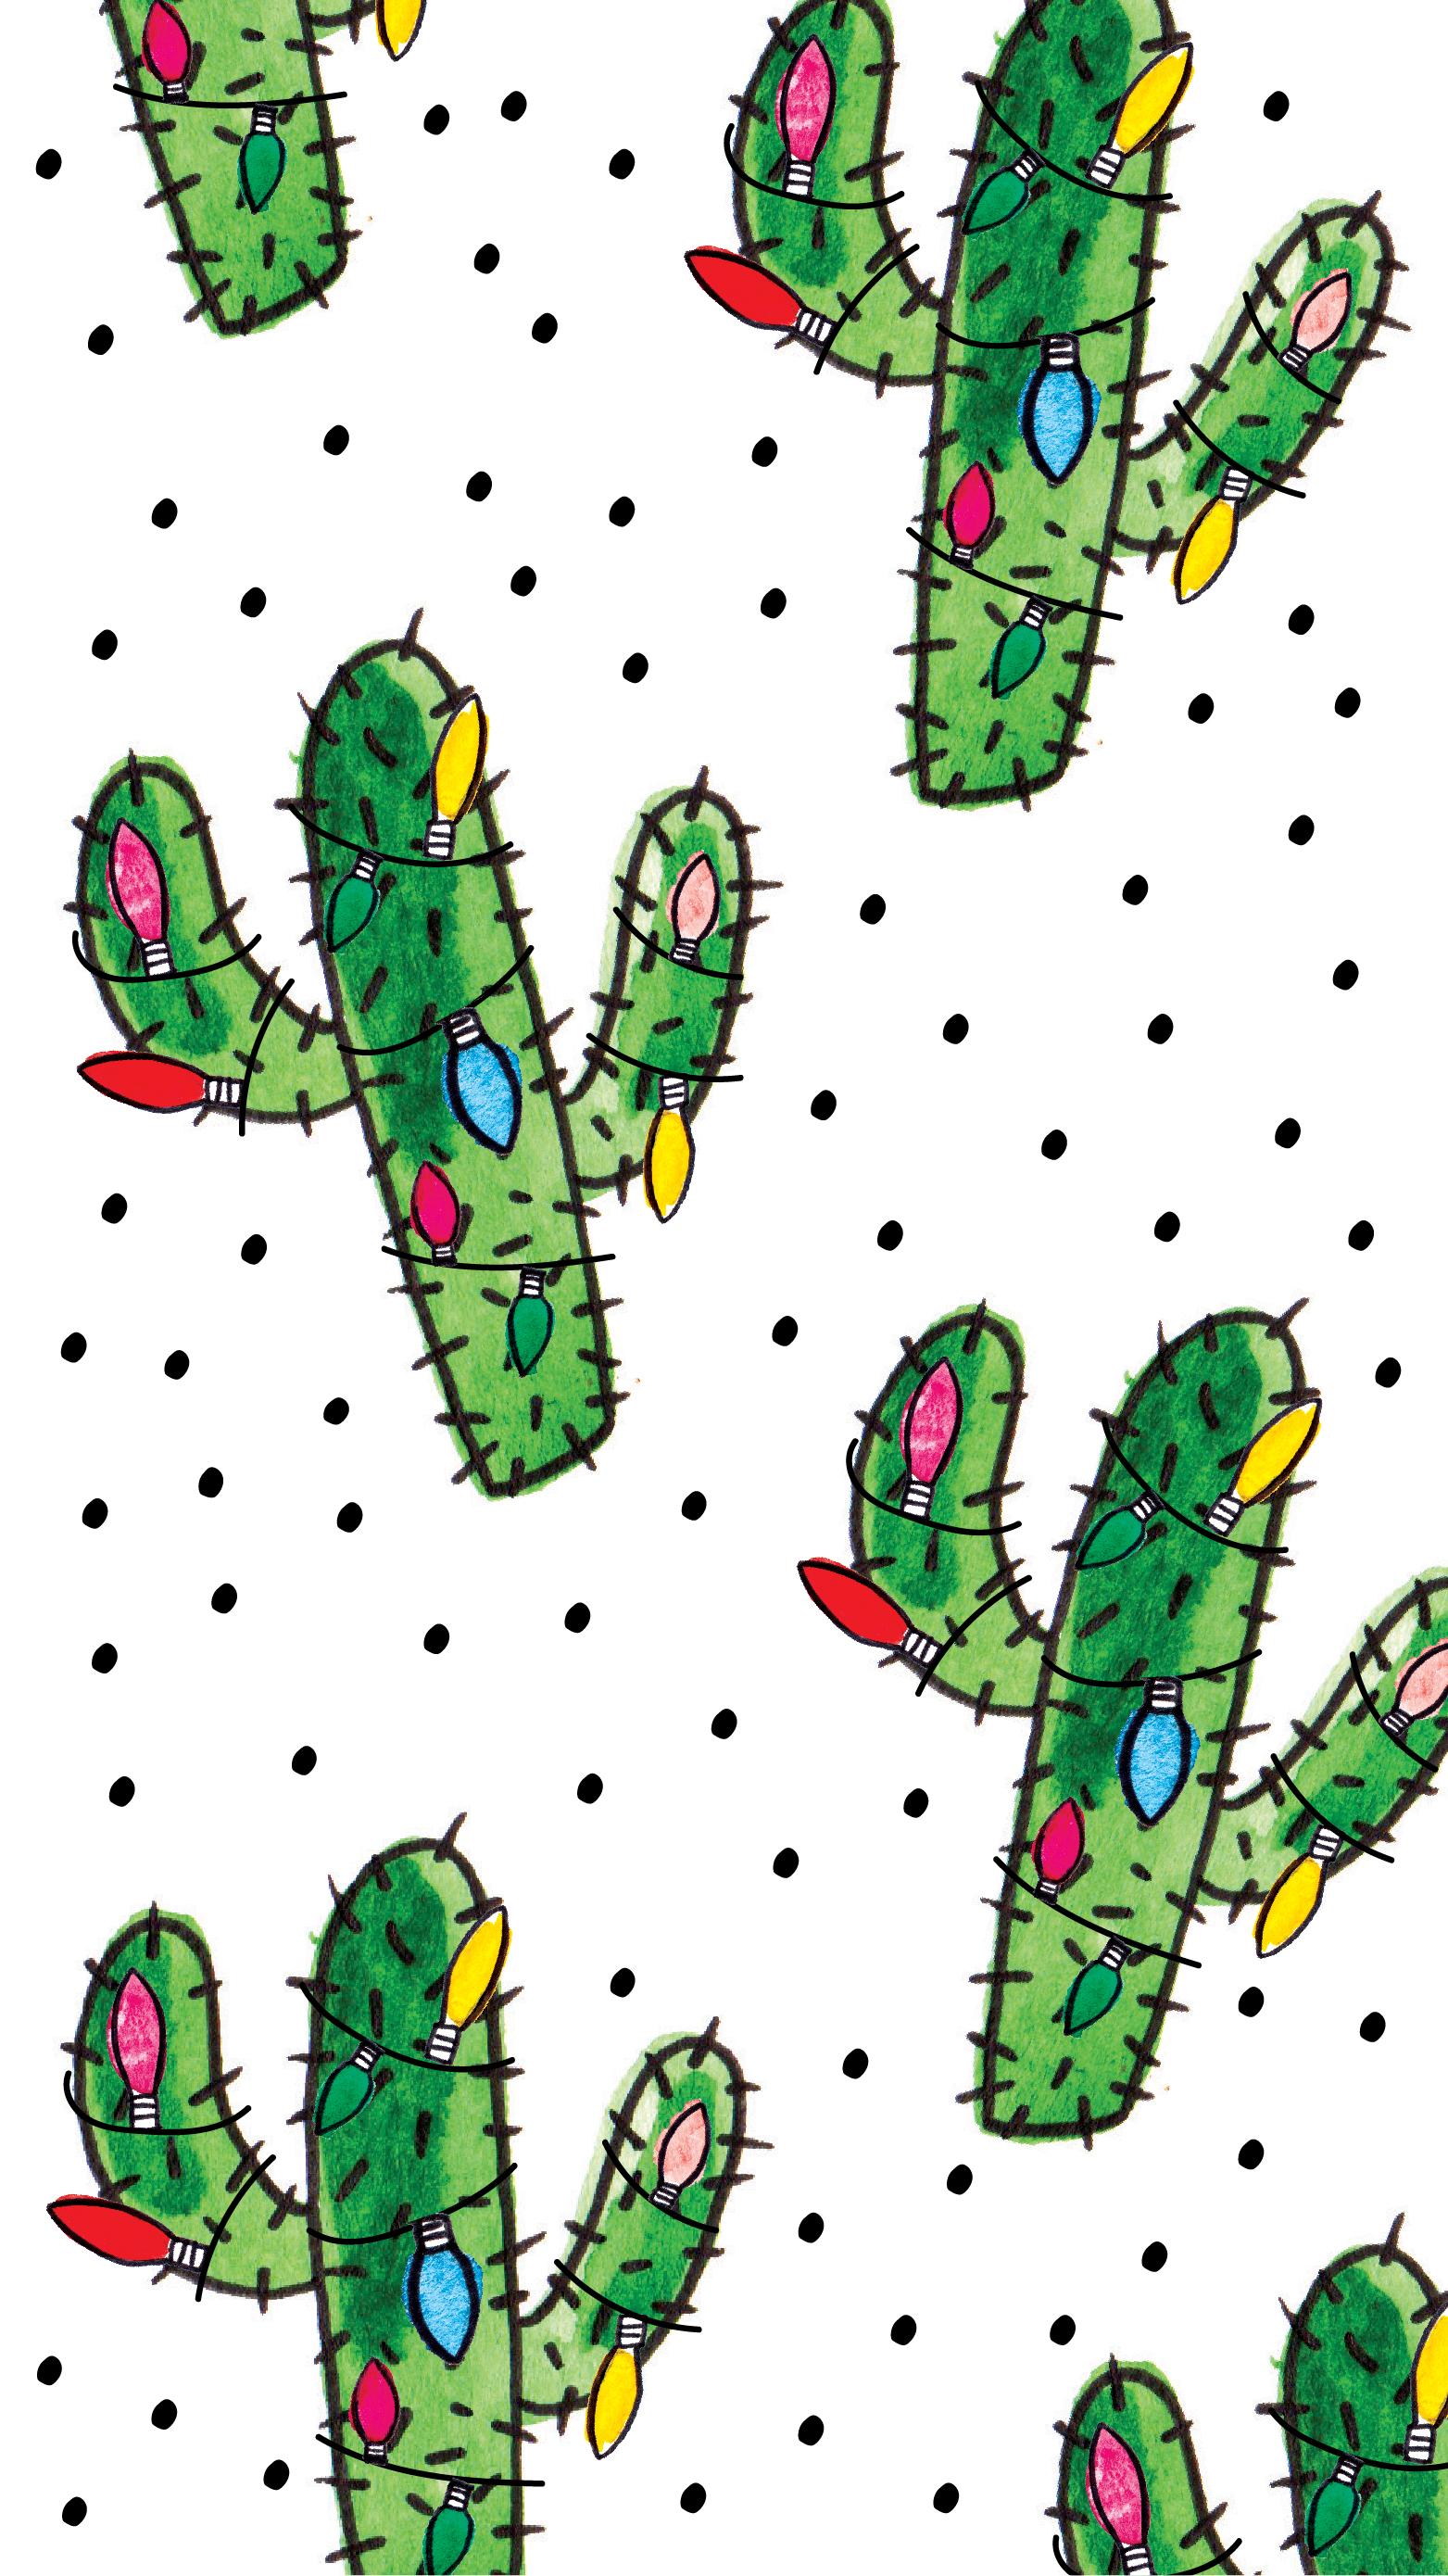 Phone_Background_Christmas_Cactus-01.jpg